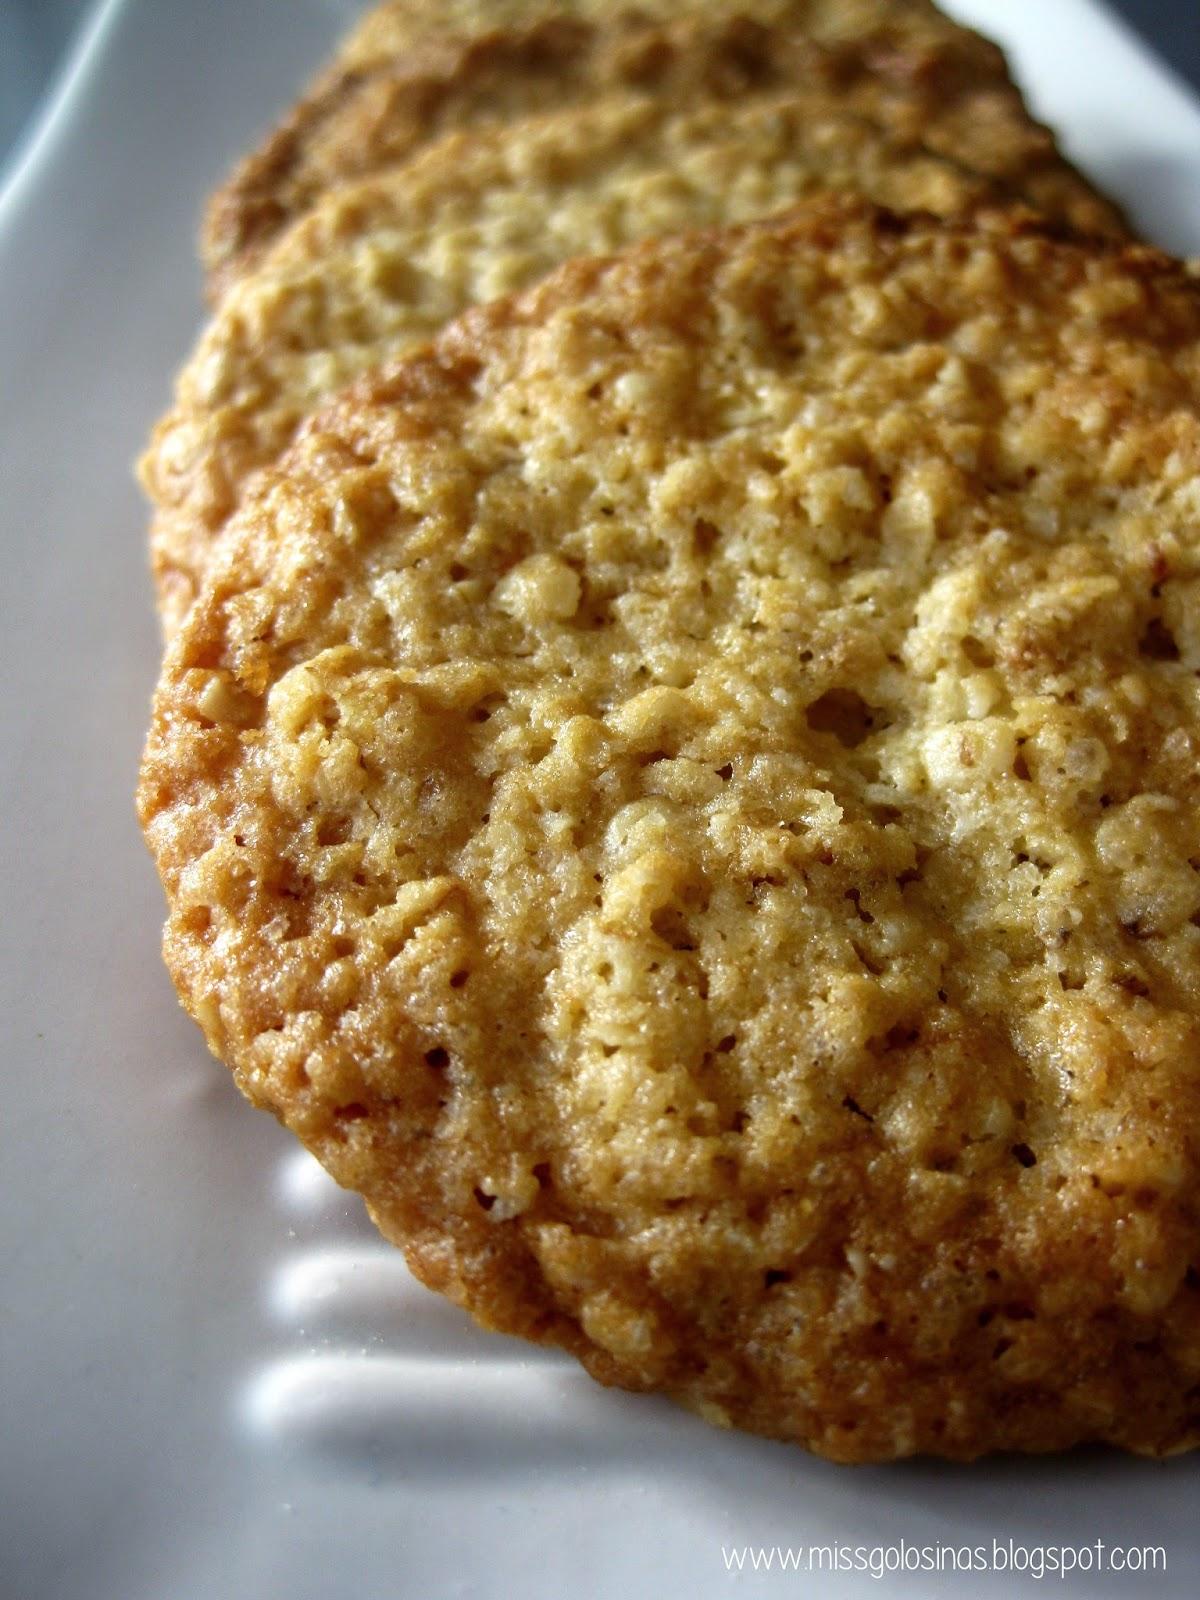 Oatmeal cookies, galletas de copos de avena